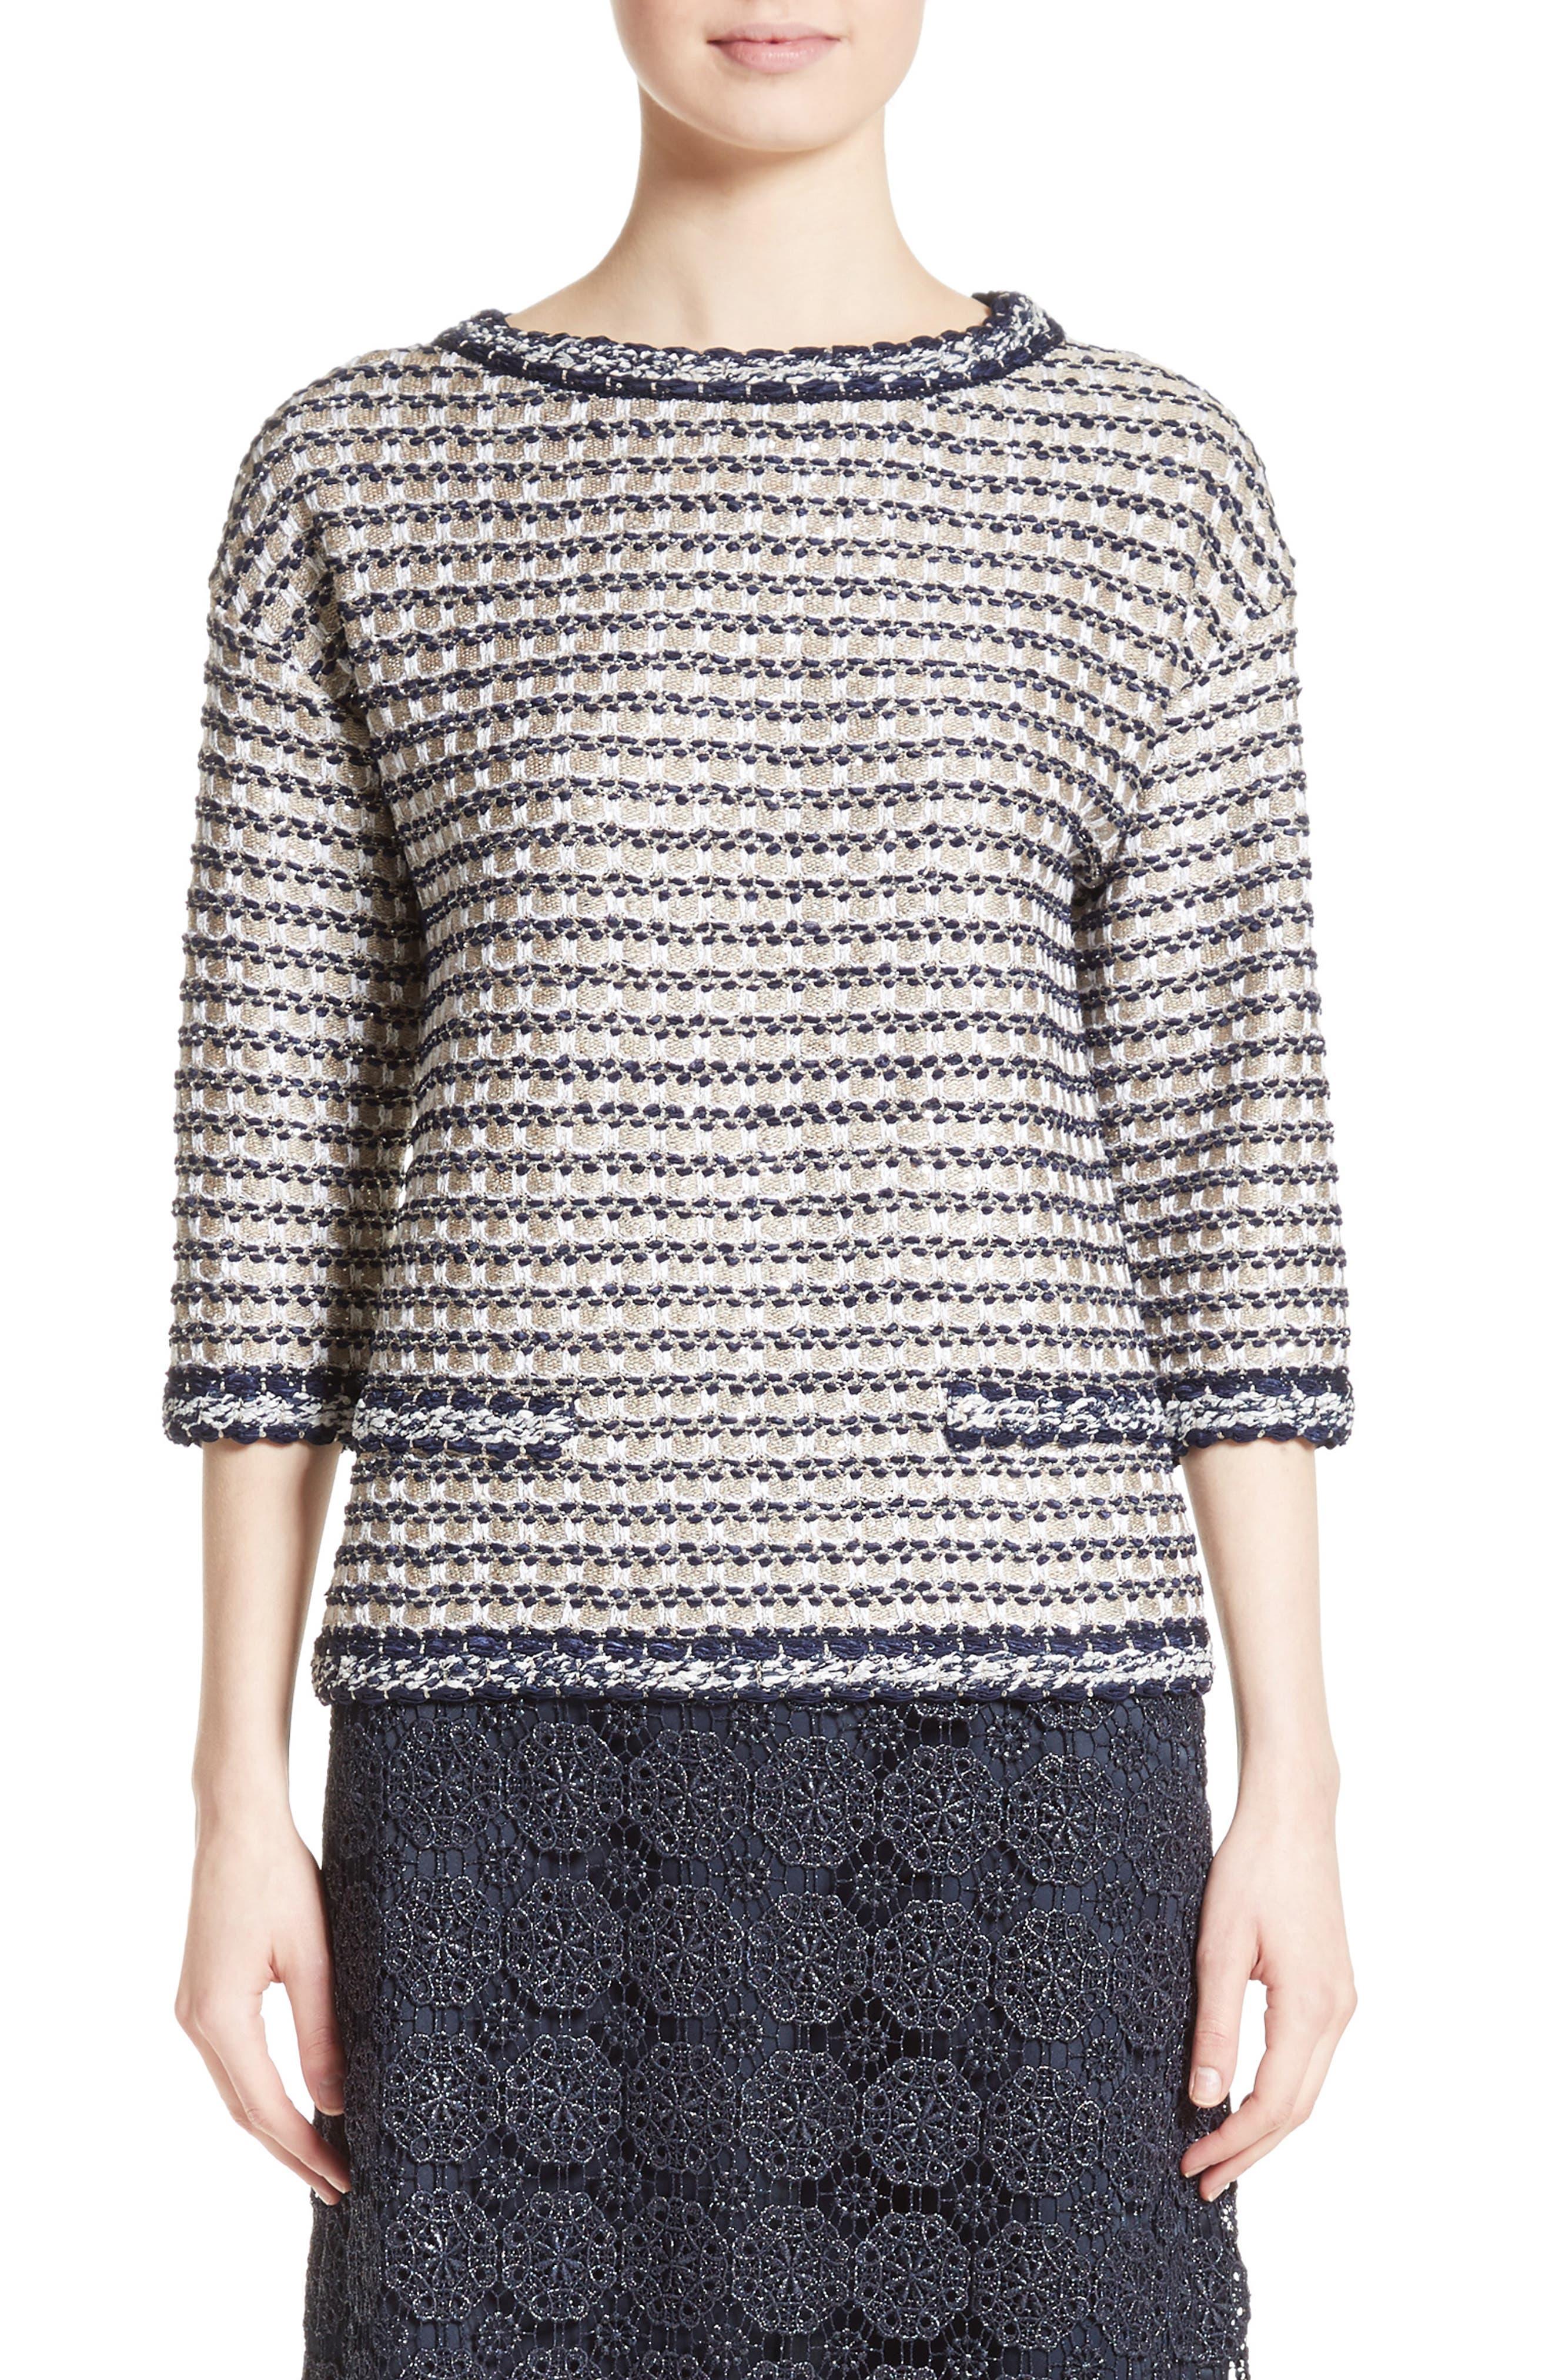 Main Image - St. John Collection Vany Tweed Knit Top